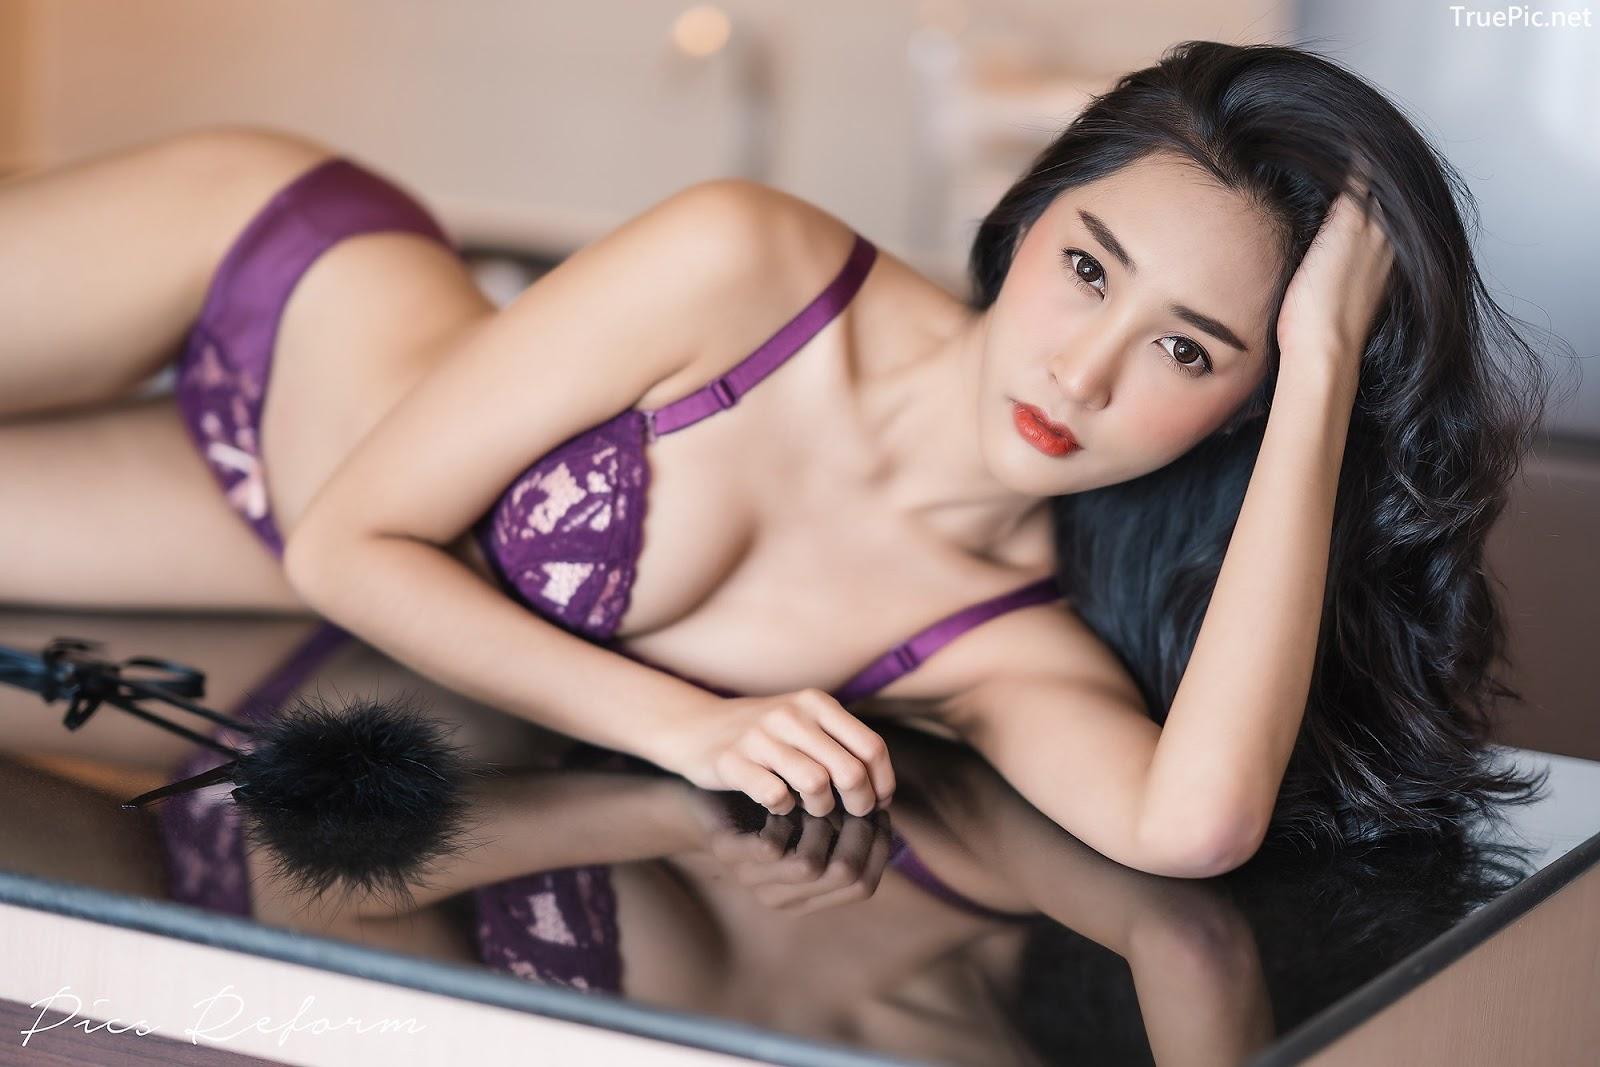 Image-Thailand-Sexy-Model-Yanapat-Ukkararujipat-Violet-Girl-TruePic.net- Picture-10